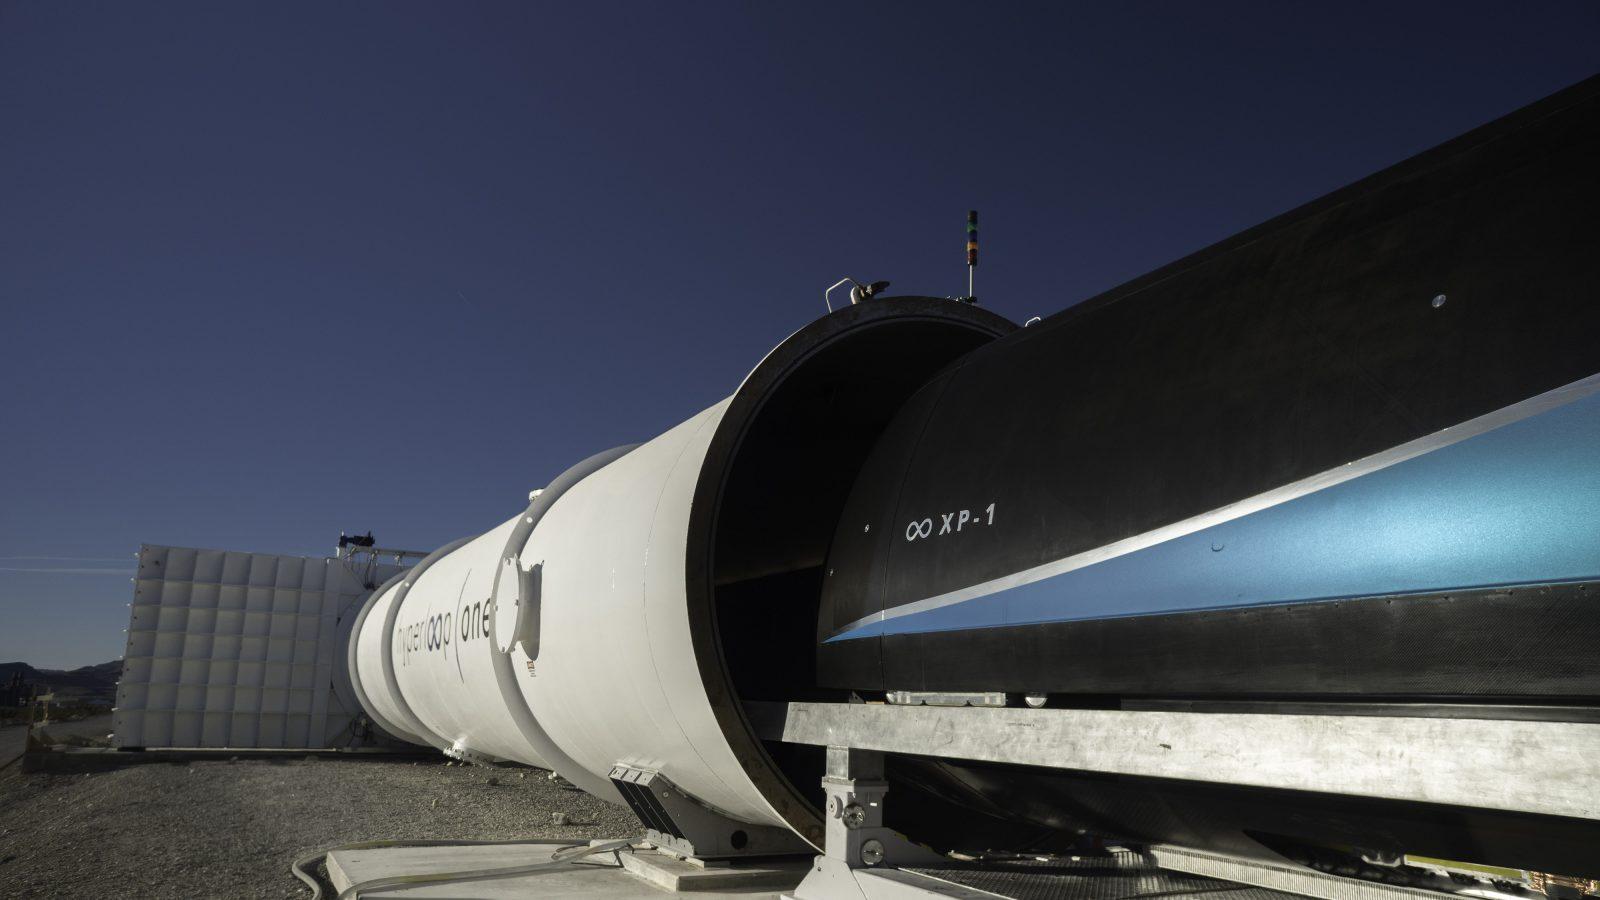 Washington DC has given Elon Musk a permit for his Hyperloop